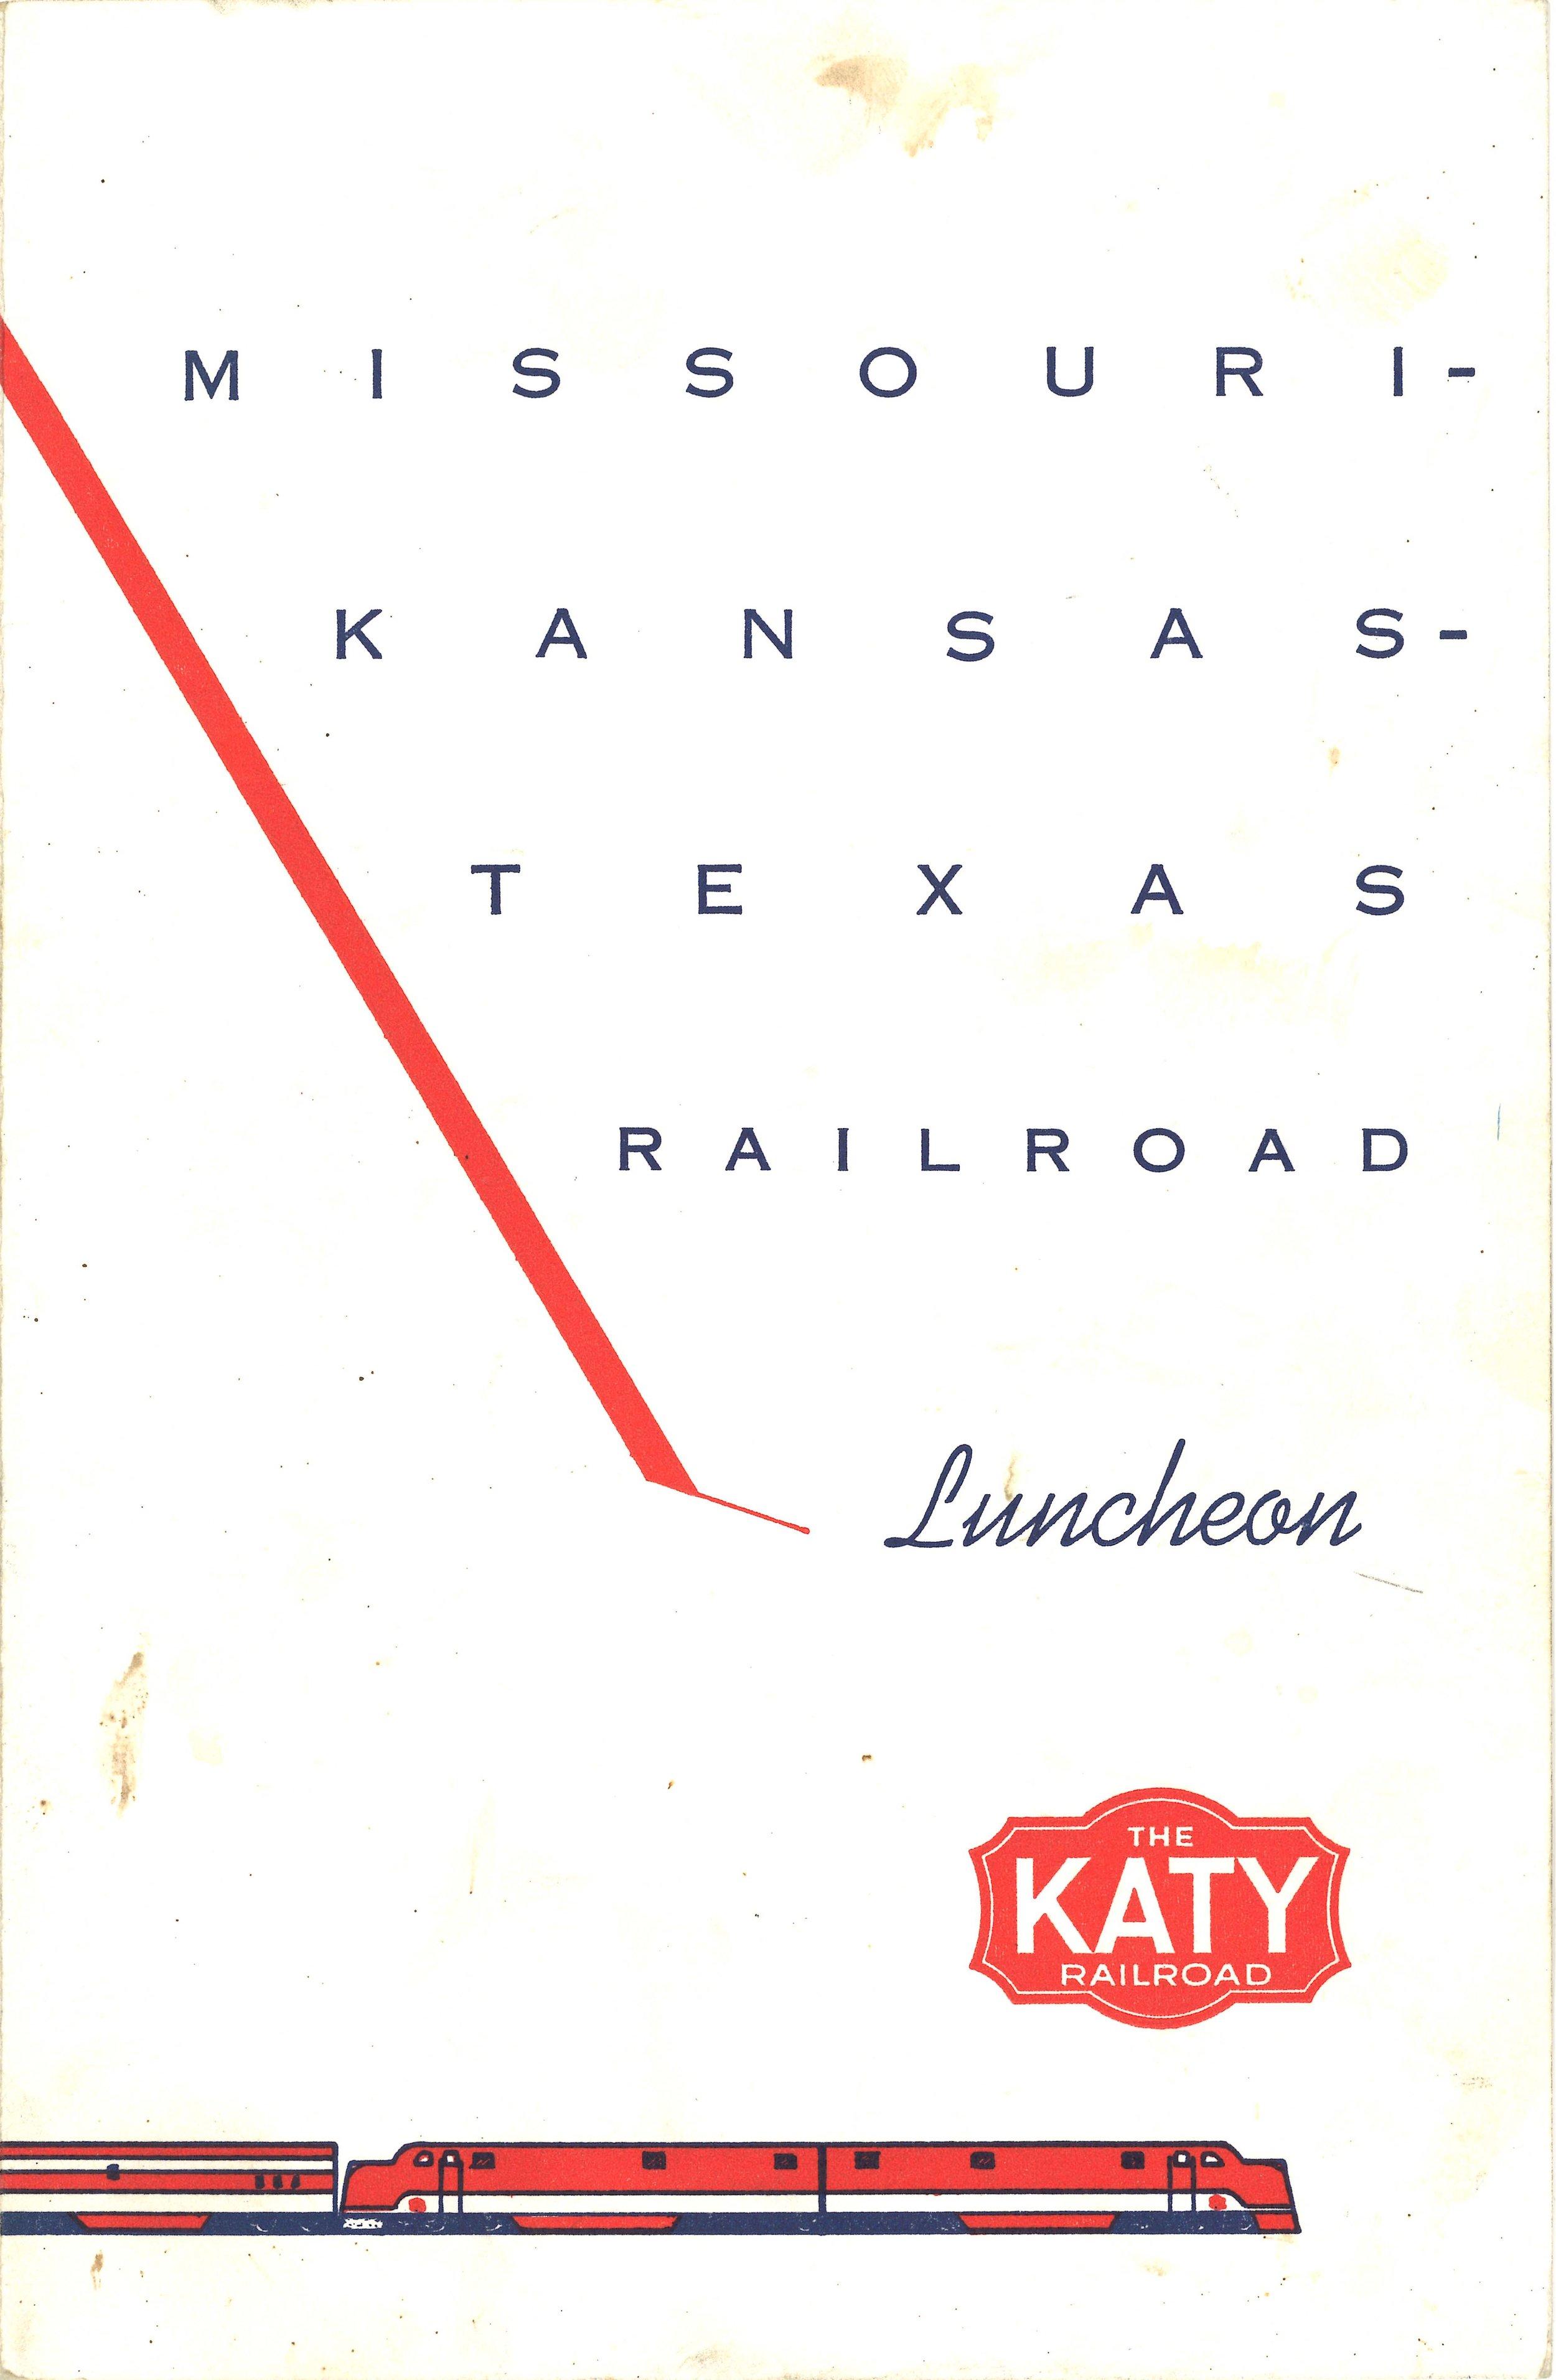 MKT Railroad Katy Railroad Lunch Menu _Sm1a.jpg